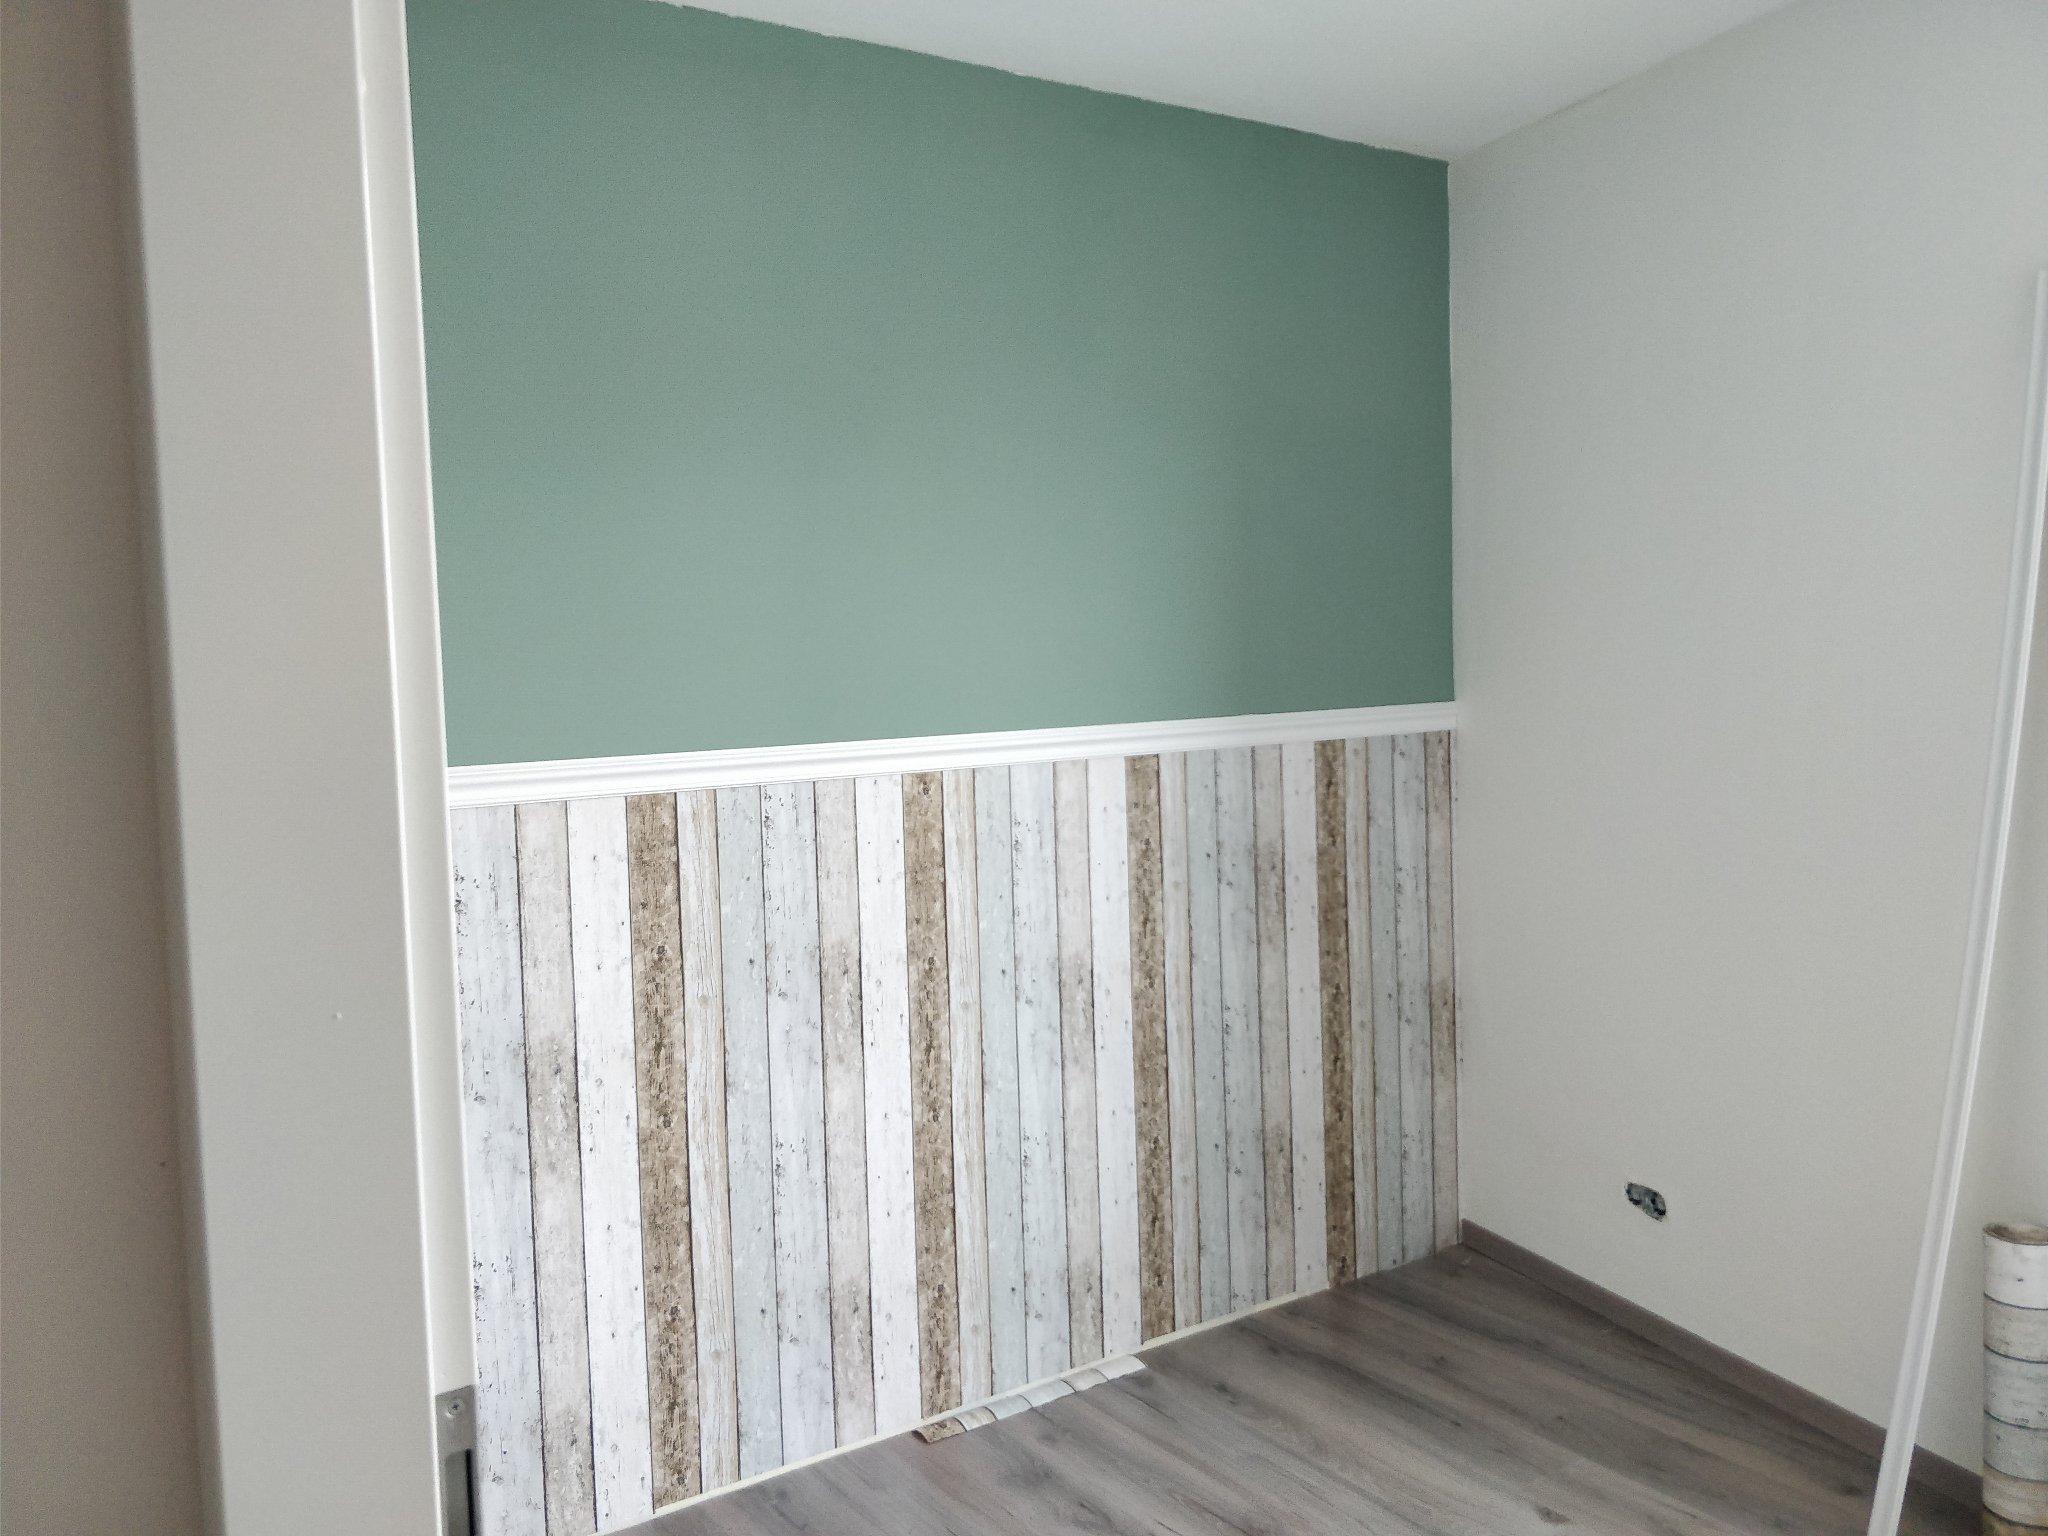 Steigerhout Muur Slaapkamer : Steigerhout behang slaapkamer. cheap het is een behang waarmee je